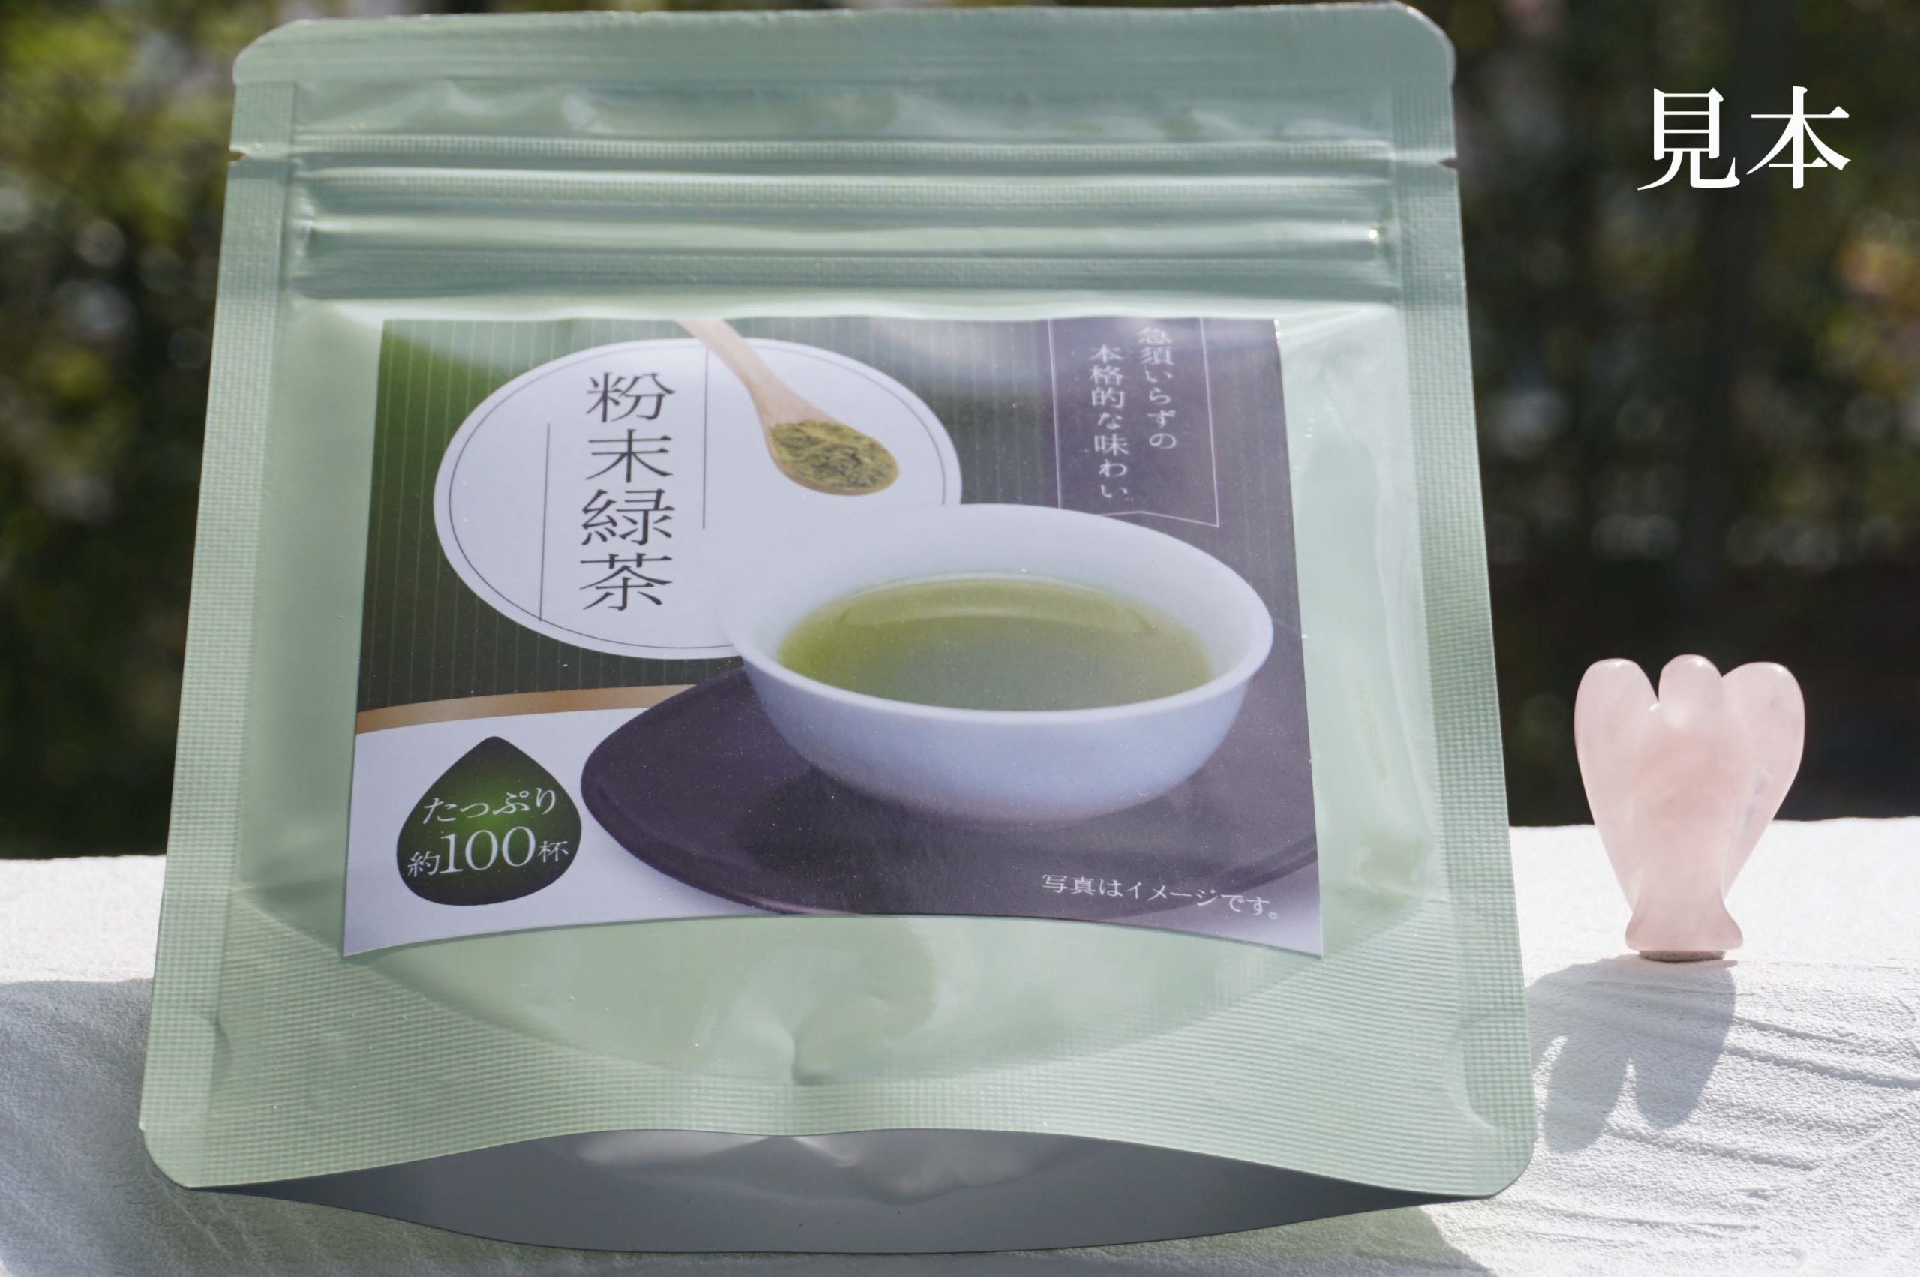 powder-tea-set